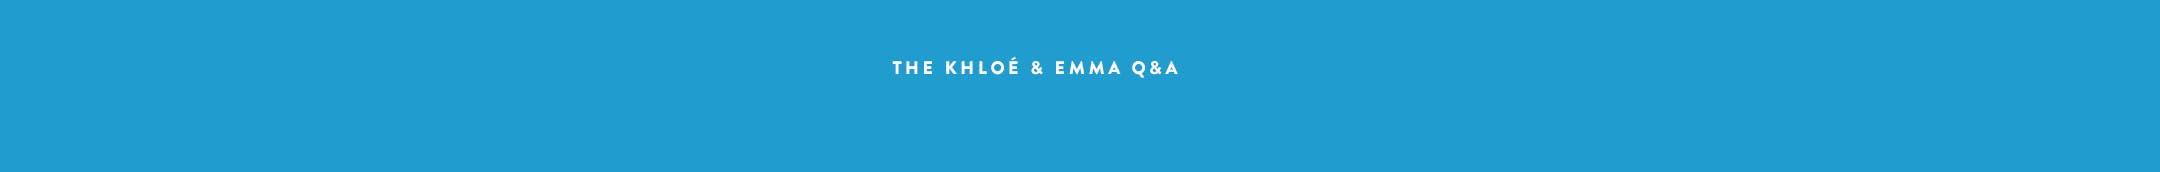 The Khloe and Emma Good American Q&A.